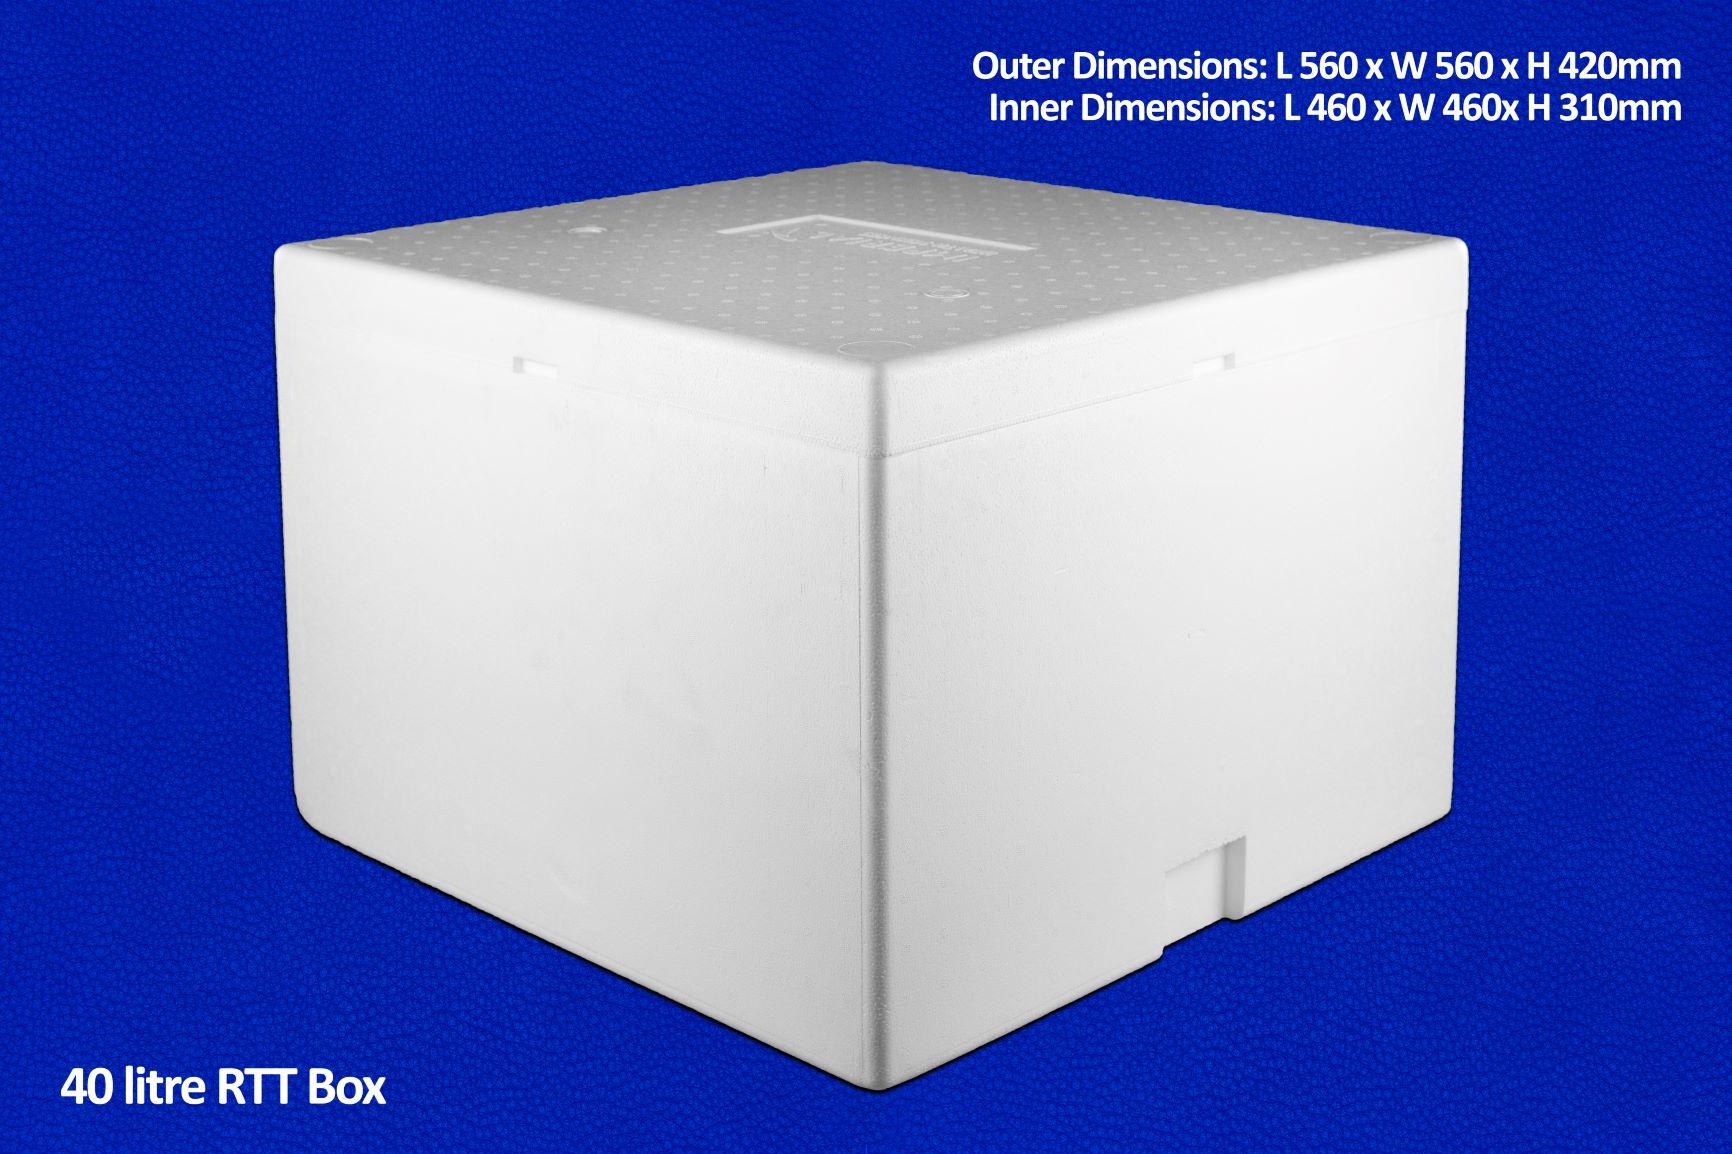 40 litre RTT Box